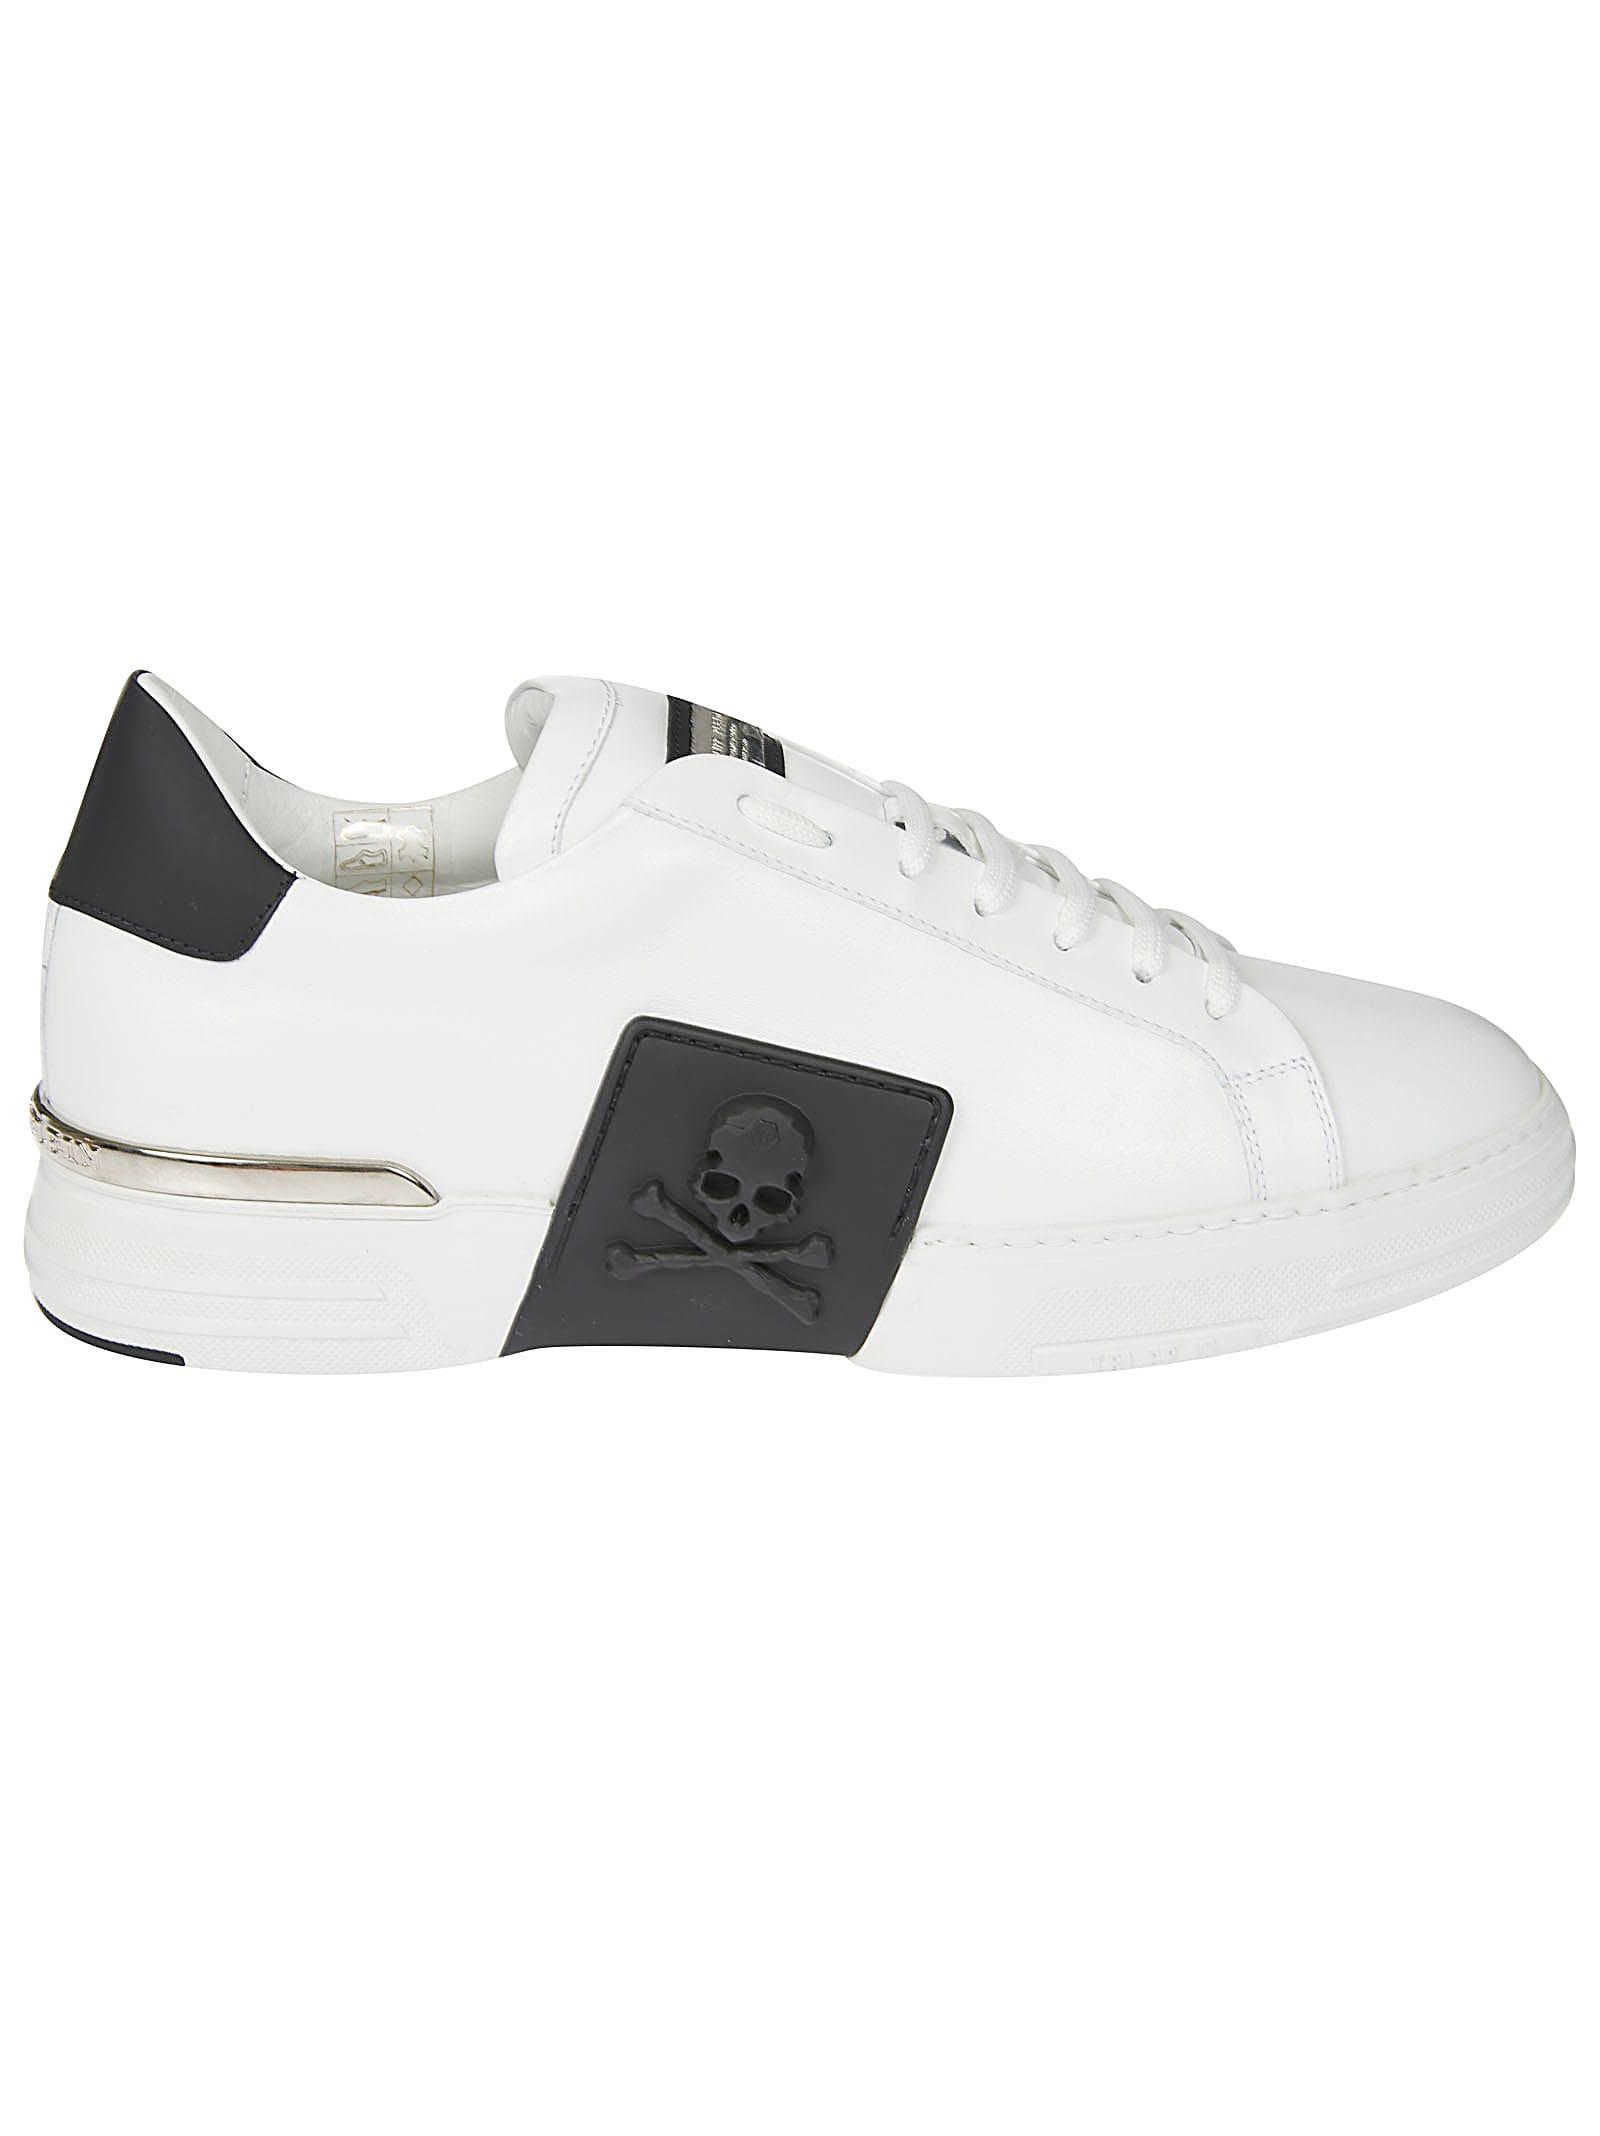 Philipp Plein Sneakers | italist